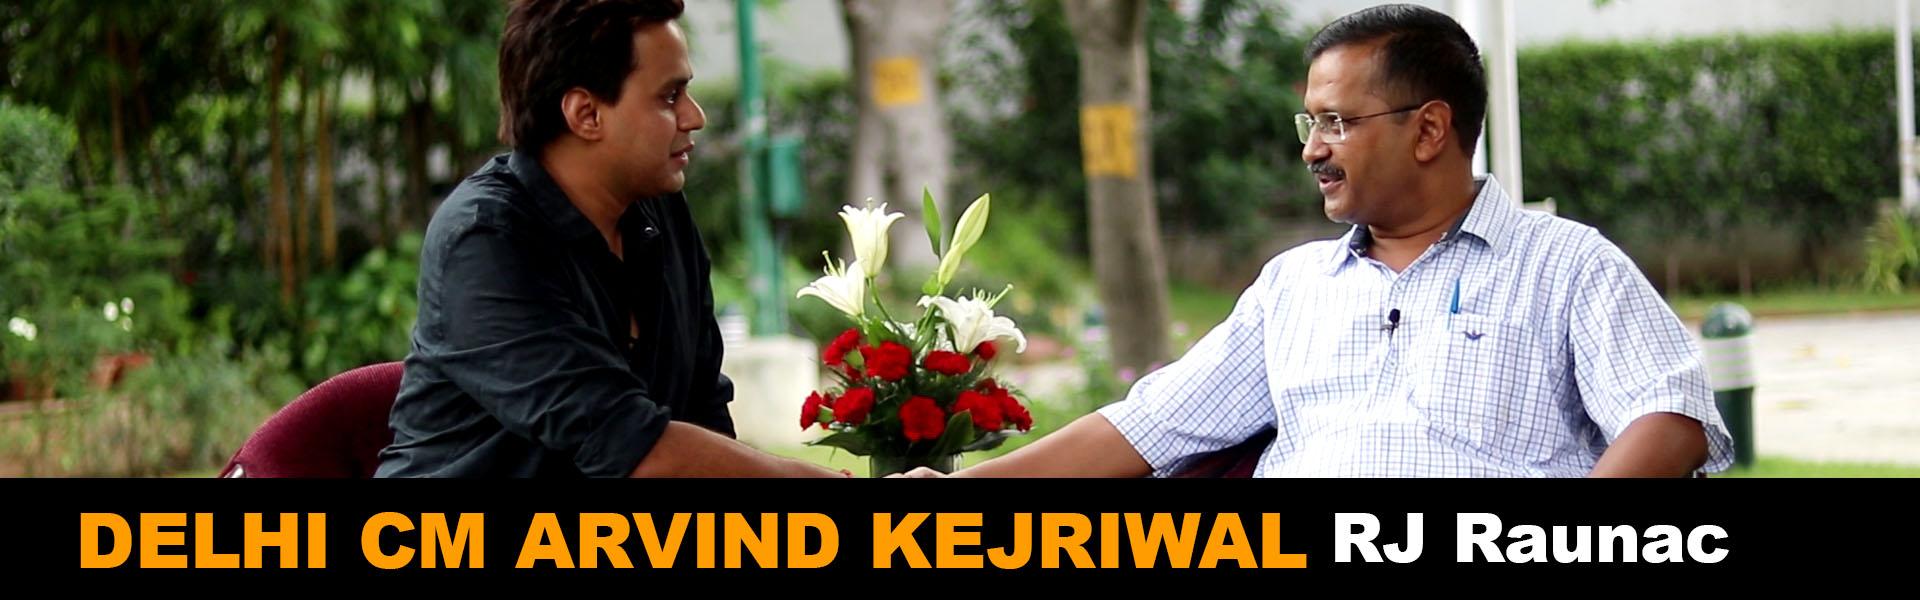 RJ Raunac with Arvind Kejriwal | Chief Minister Delhi